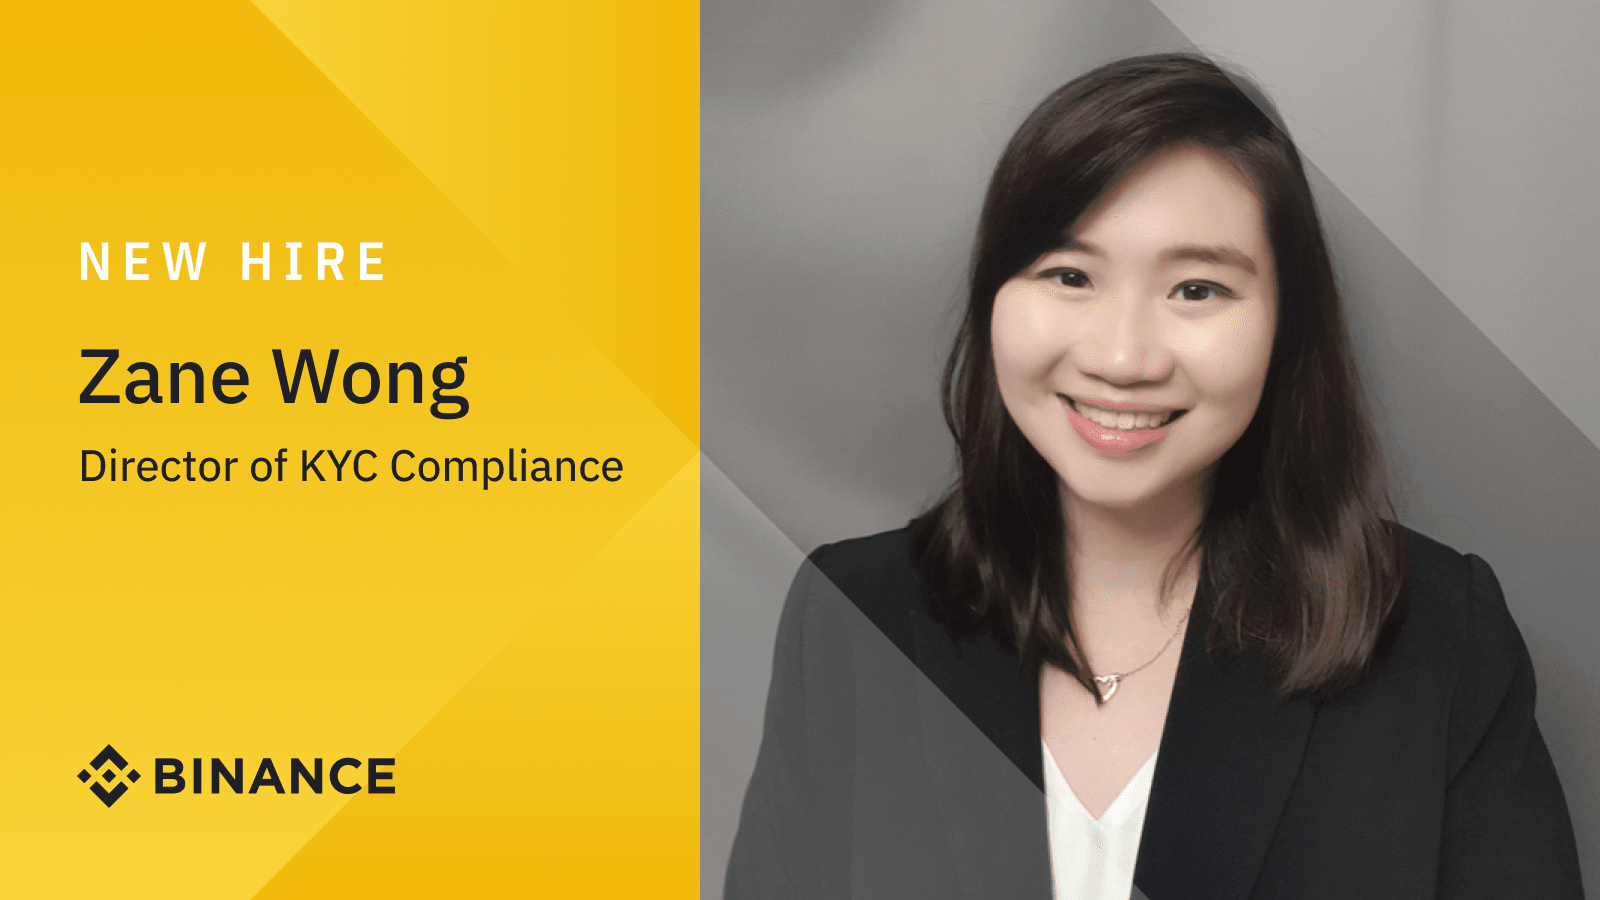 Binance Appoints Zane Wong as Director of KYC Compliance   Binance Blogon October 8, 2021 at 6:39 am